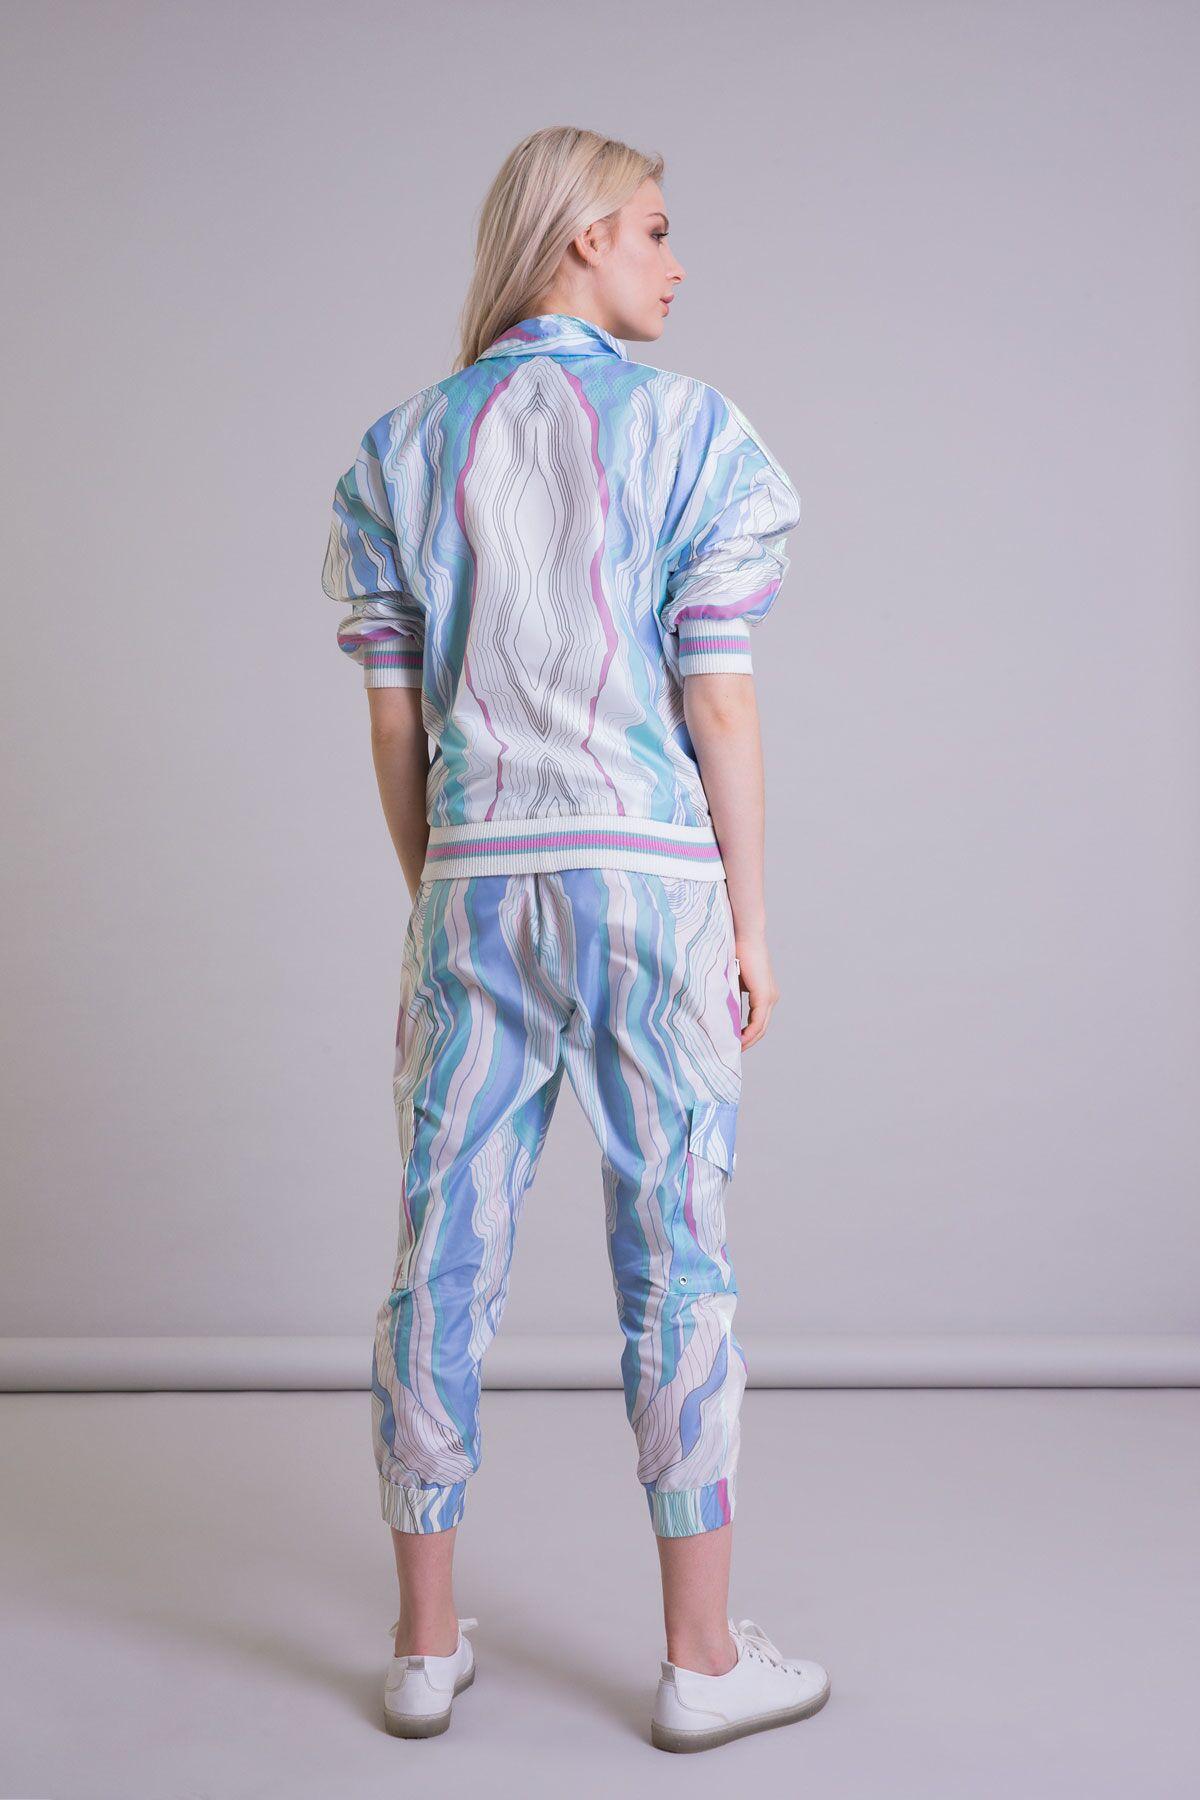 Orijinal Desenli Teknik Kumaş Kargo Pantolon